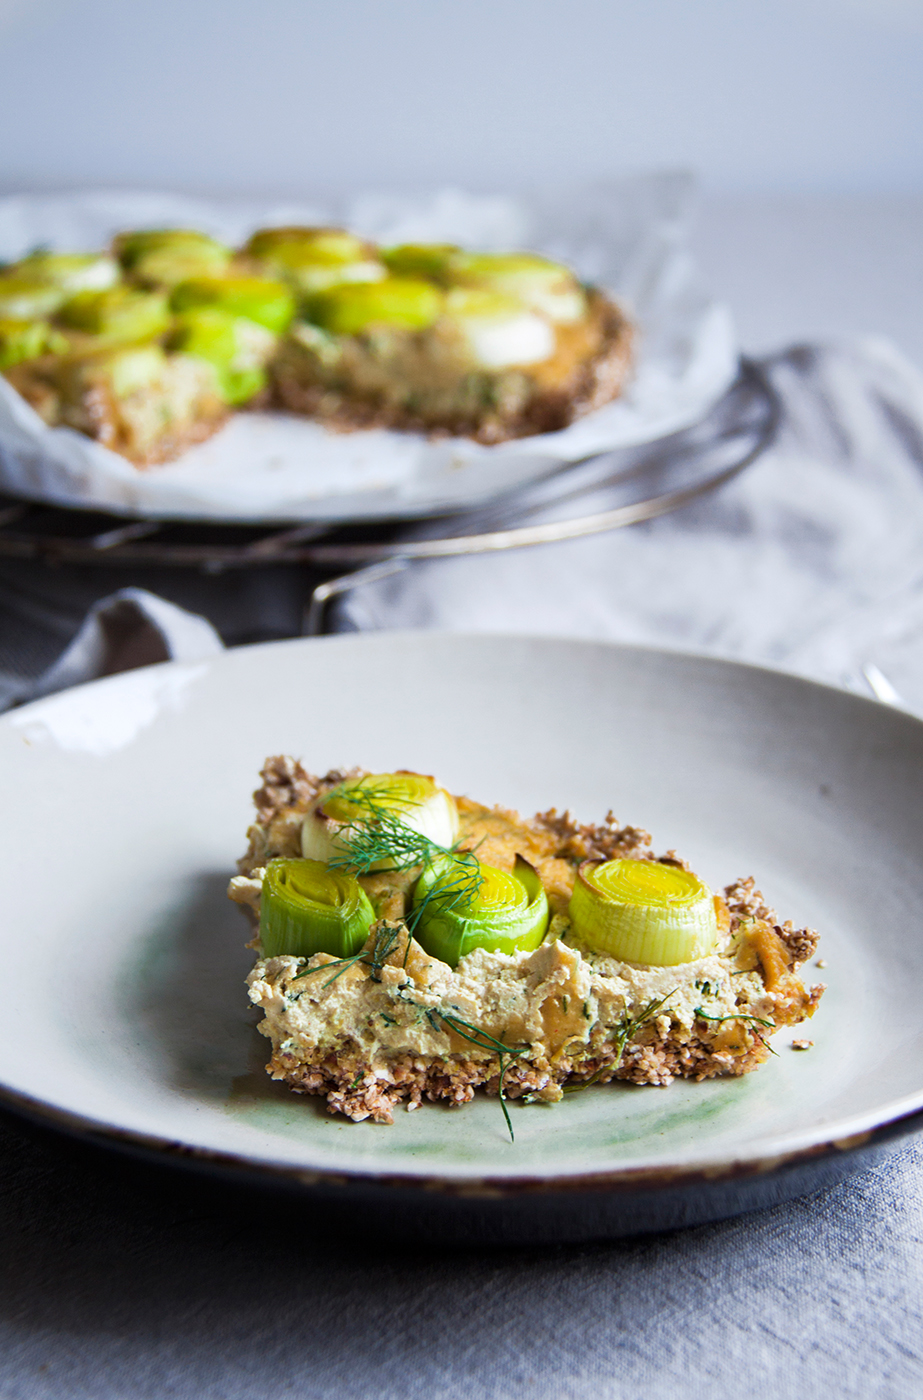 quiche-gebrande-prei-mosterd-dille-vegan-whole-foods-olievrij-02.jpg